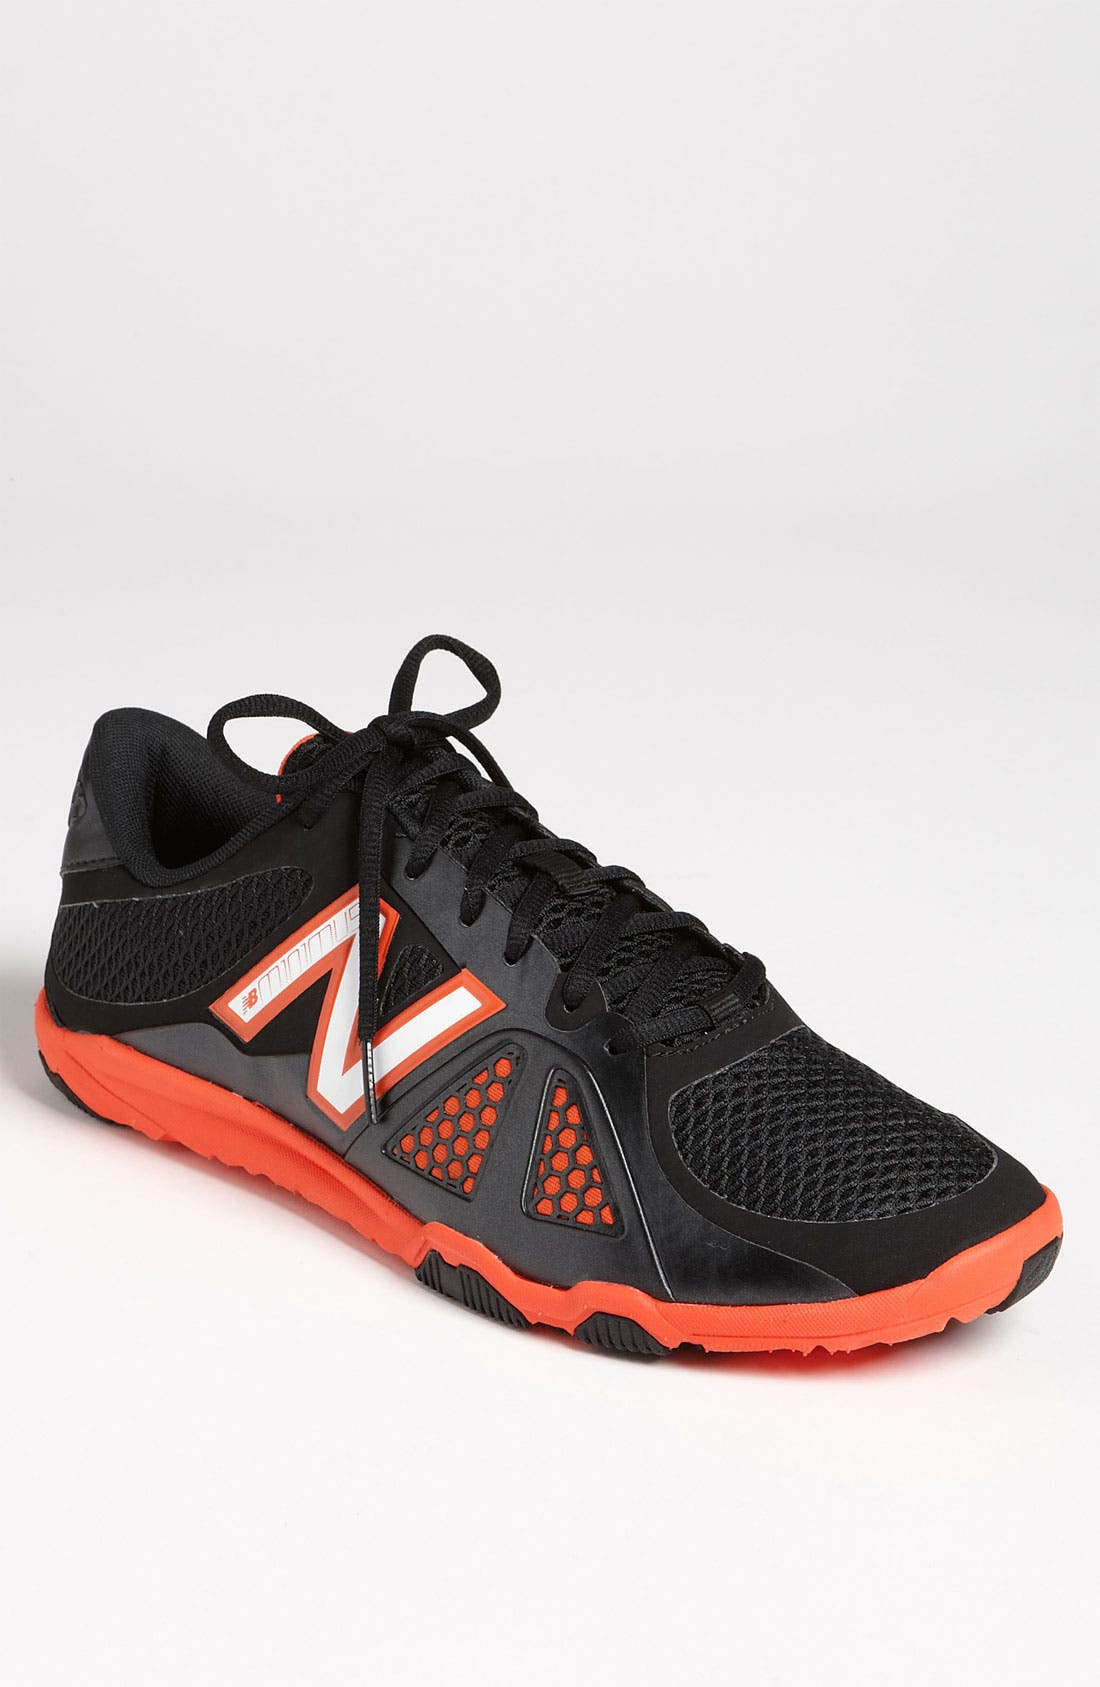 Alternate Image 1 Selected - New Balance 'Minimus' Training Shoe (Men)